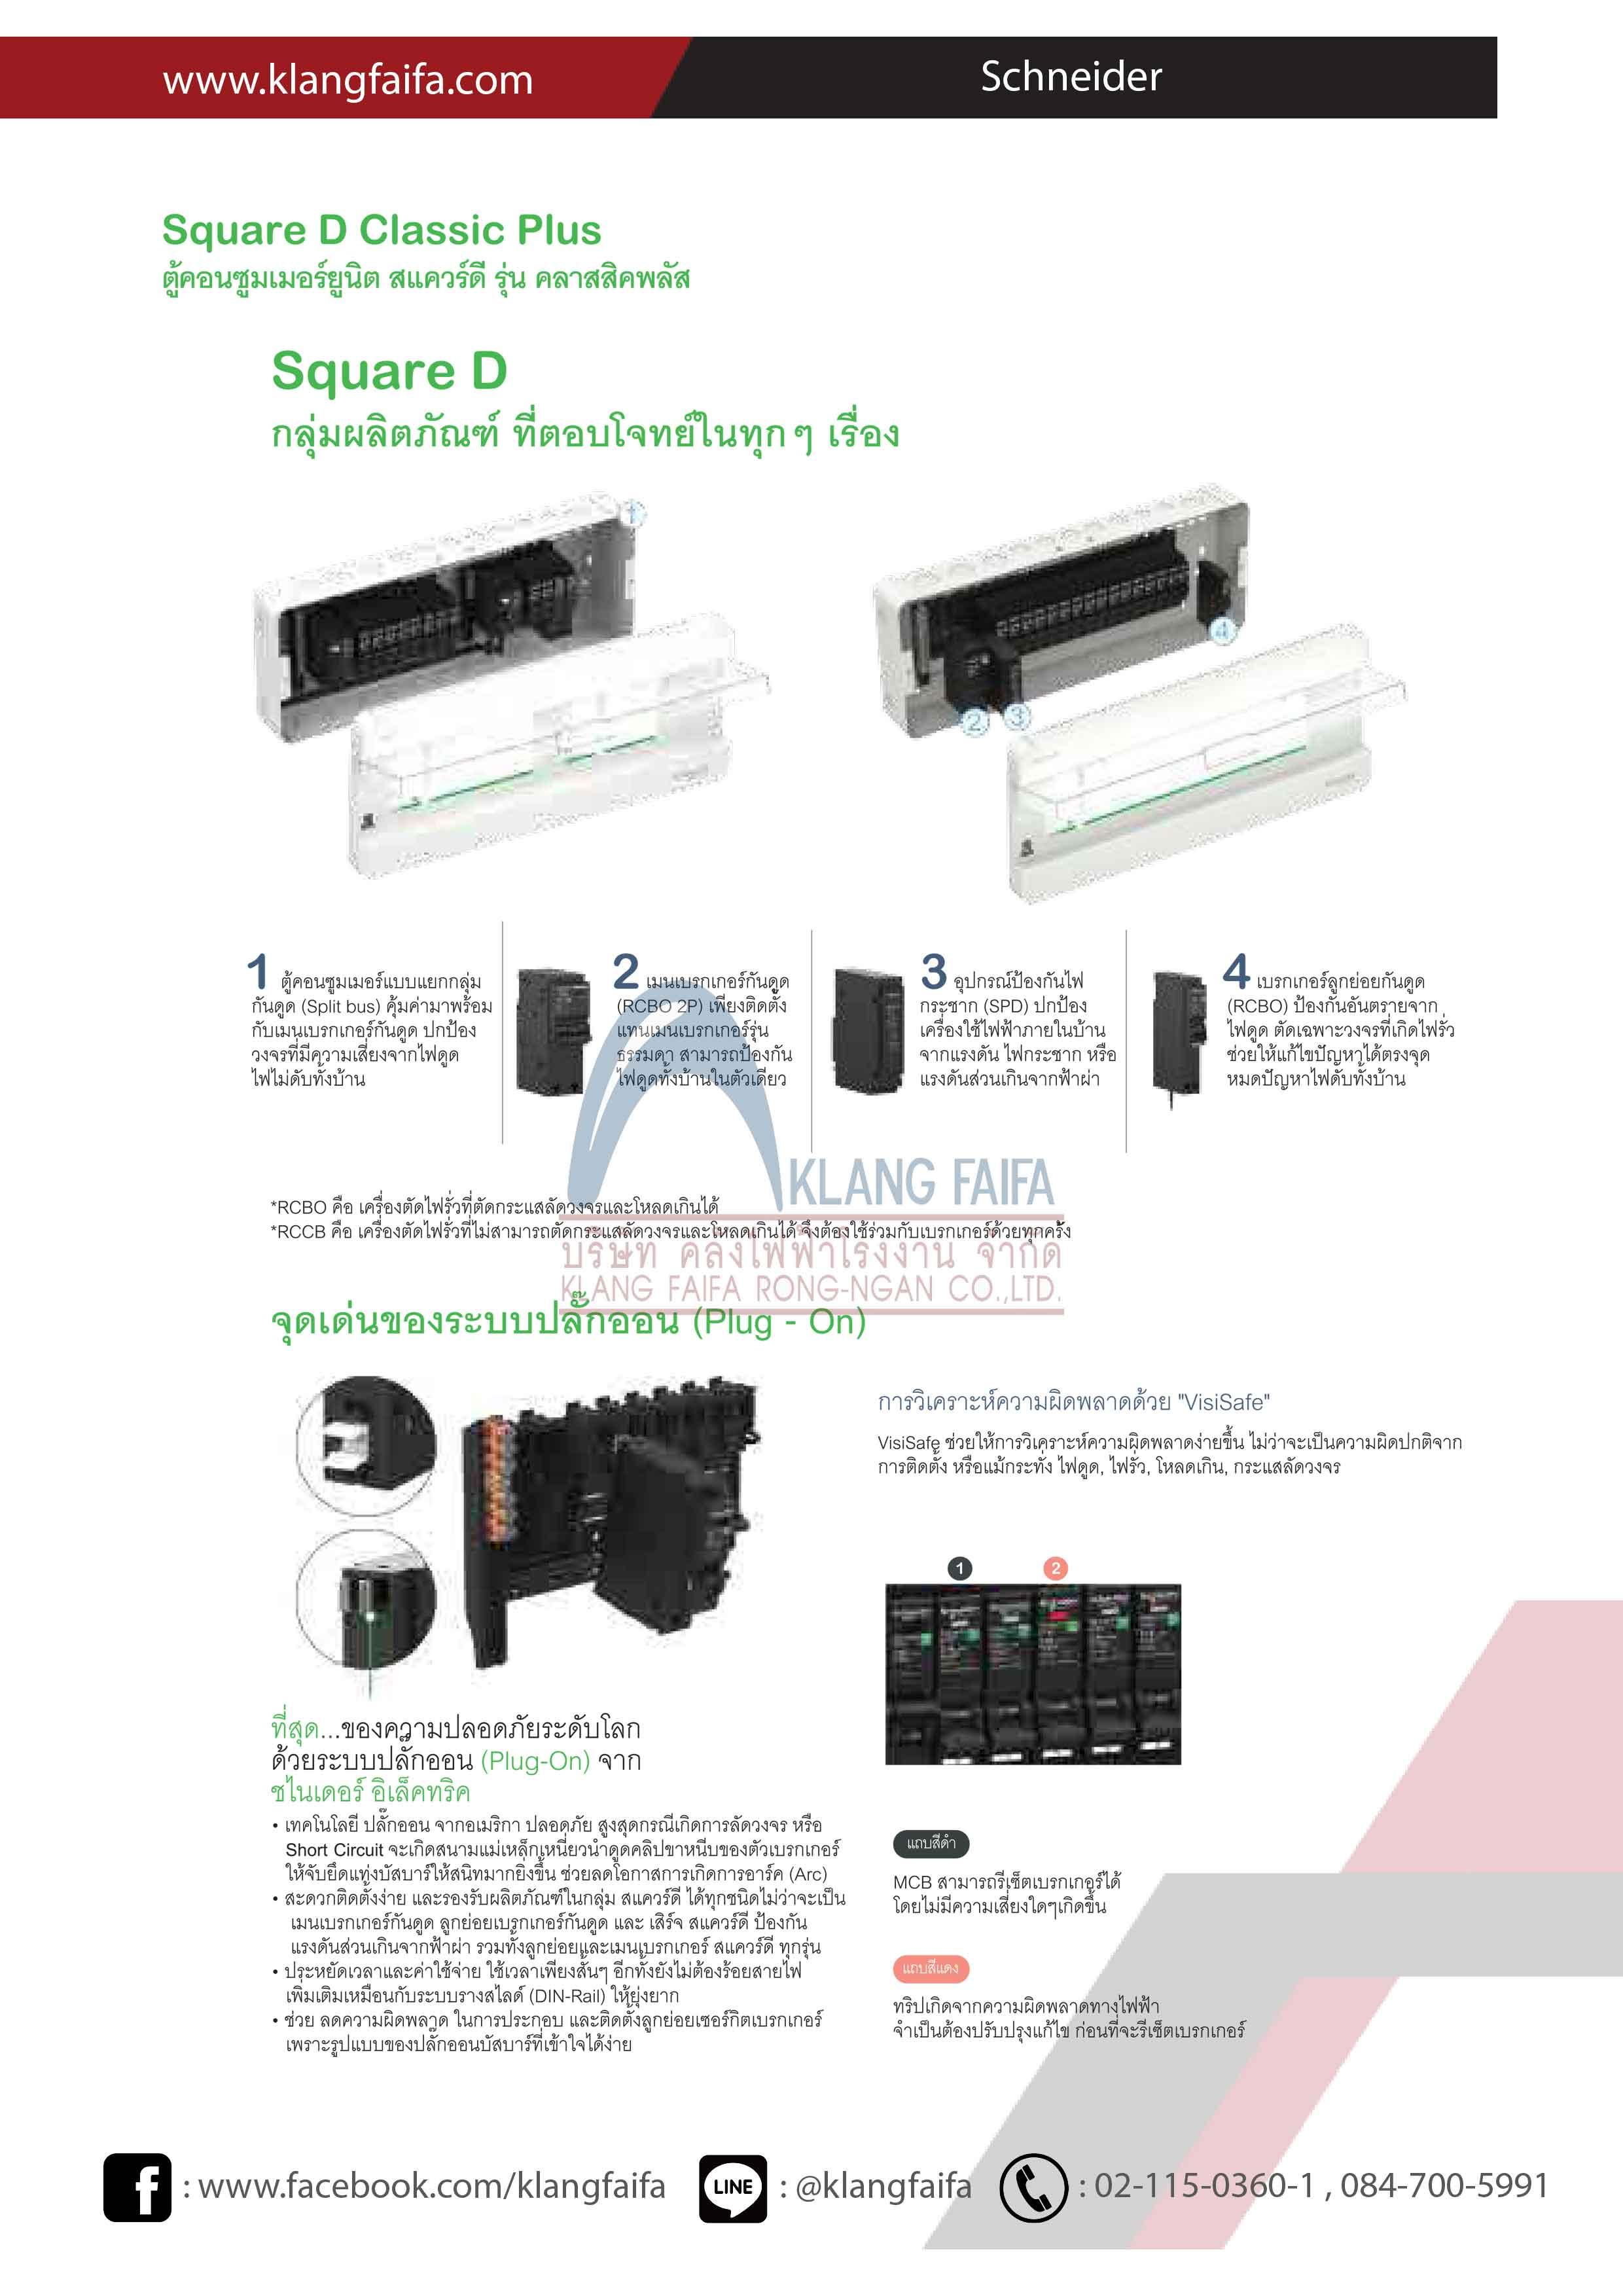 Schneider,-ชไนเดอร์,-Schneider2019,-Square-D-Classic-Plus-ตู้คอนซูเมอร์ยูนิต-สแควร์ดี-รุ่น-คลาสสิคพลัส